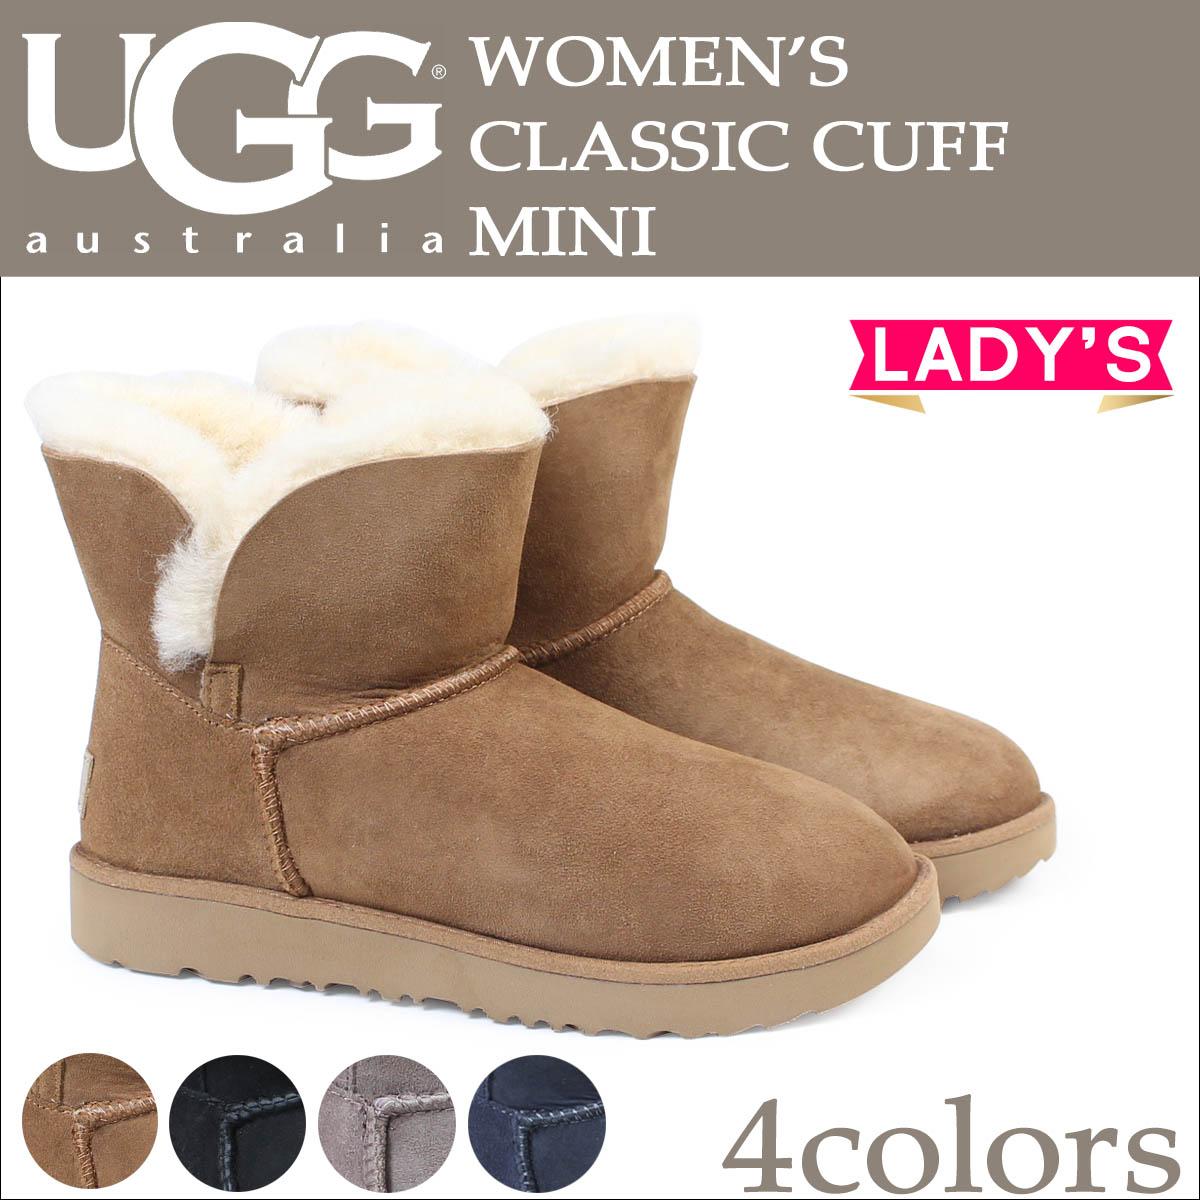 200193c176f low price ugg classic mini cuff black 2017 ddd7c 58500